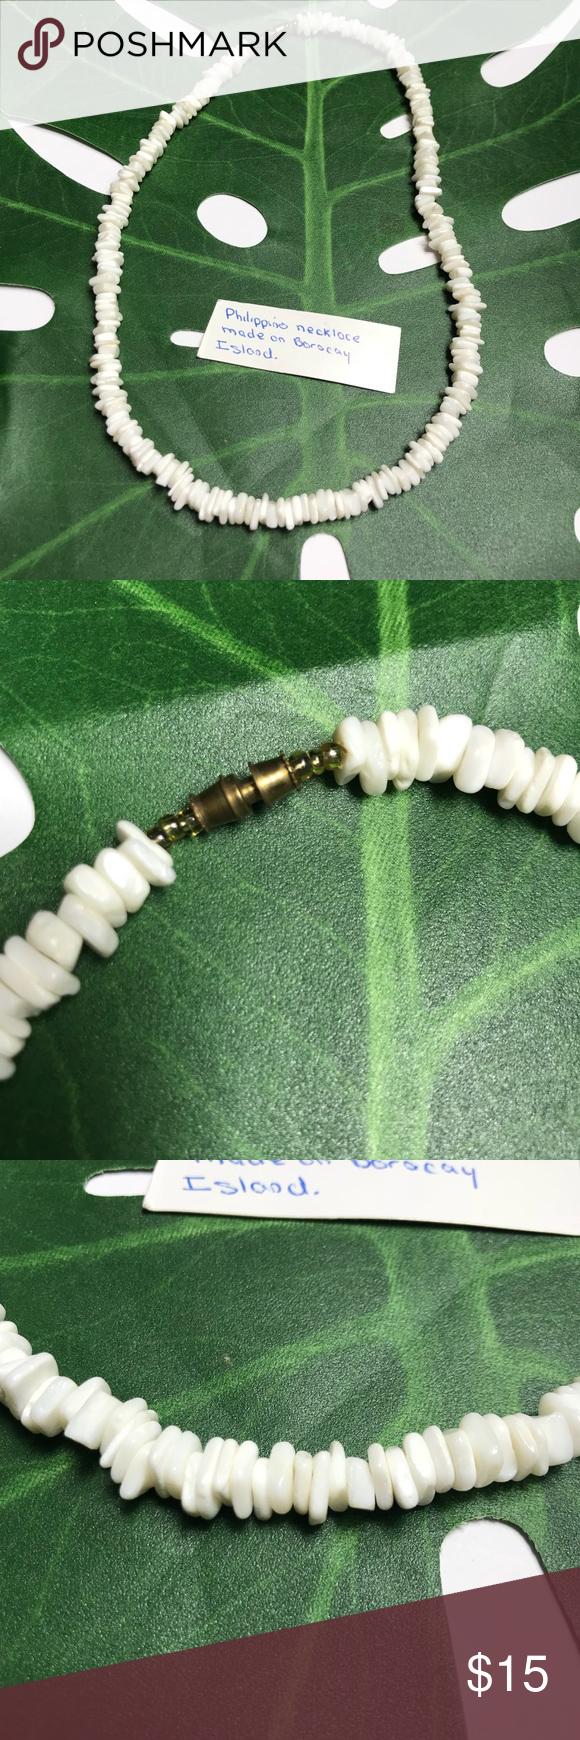 Handmade Shell Necklace Philippines Handmade shell